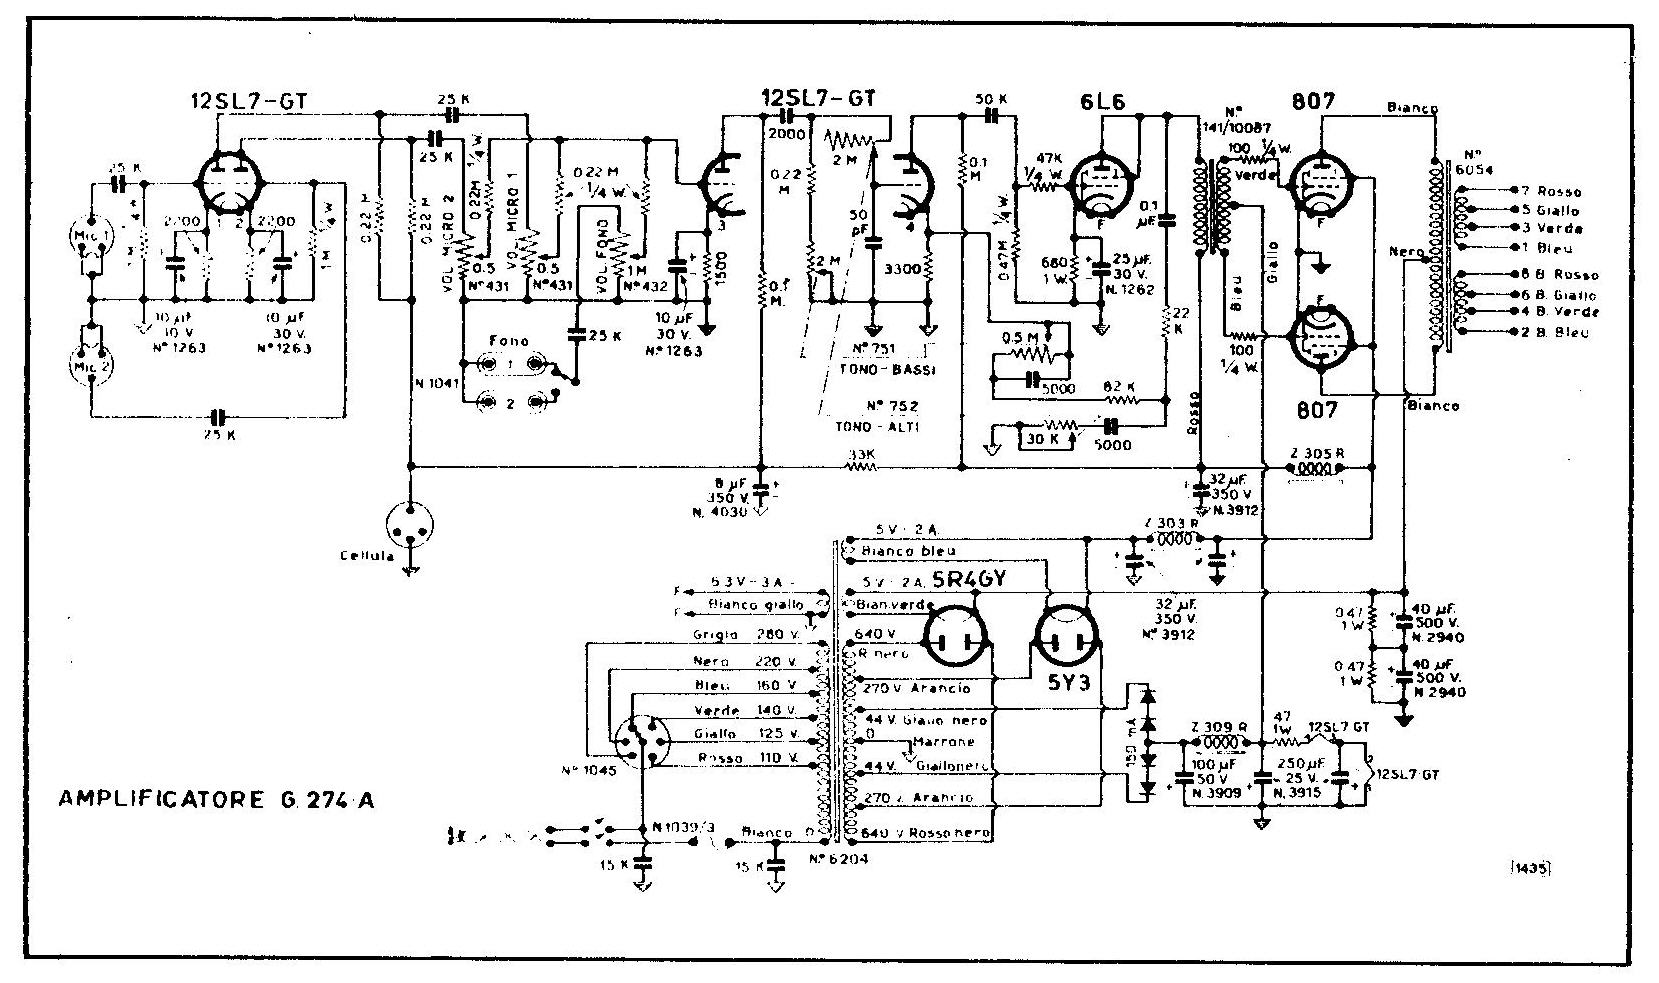 geloso g273a schematic diagam